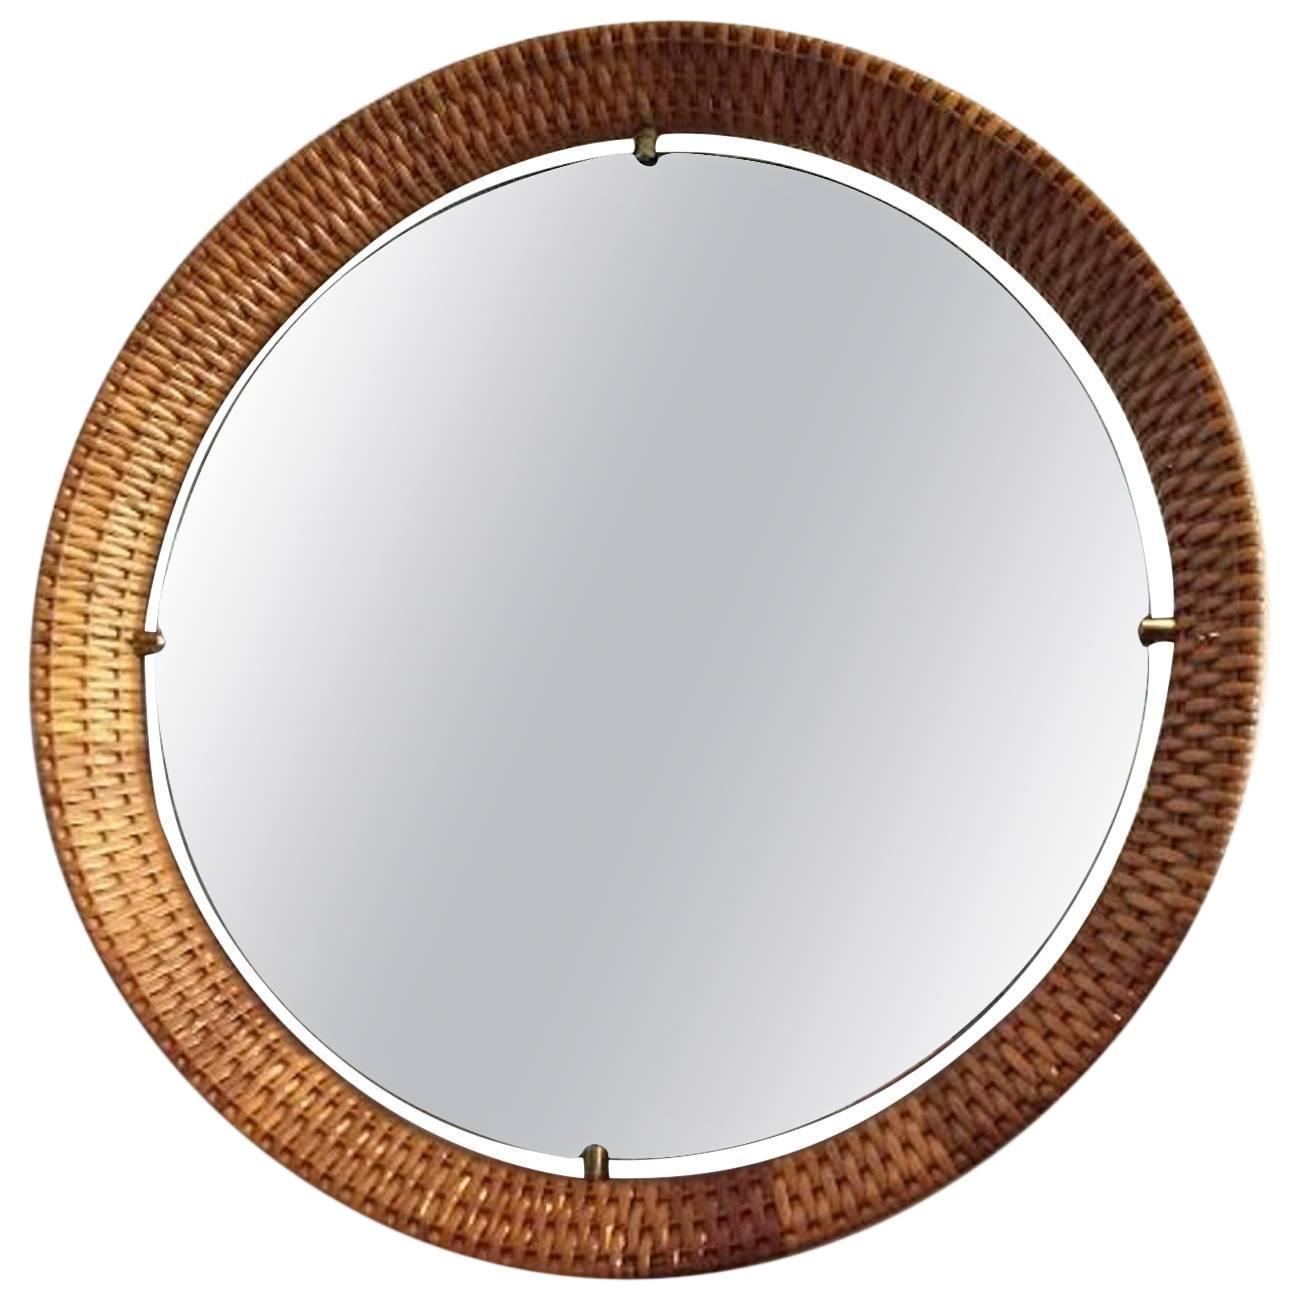 Brass Chrome Wall Vanity Mirrors